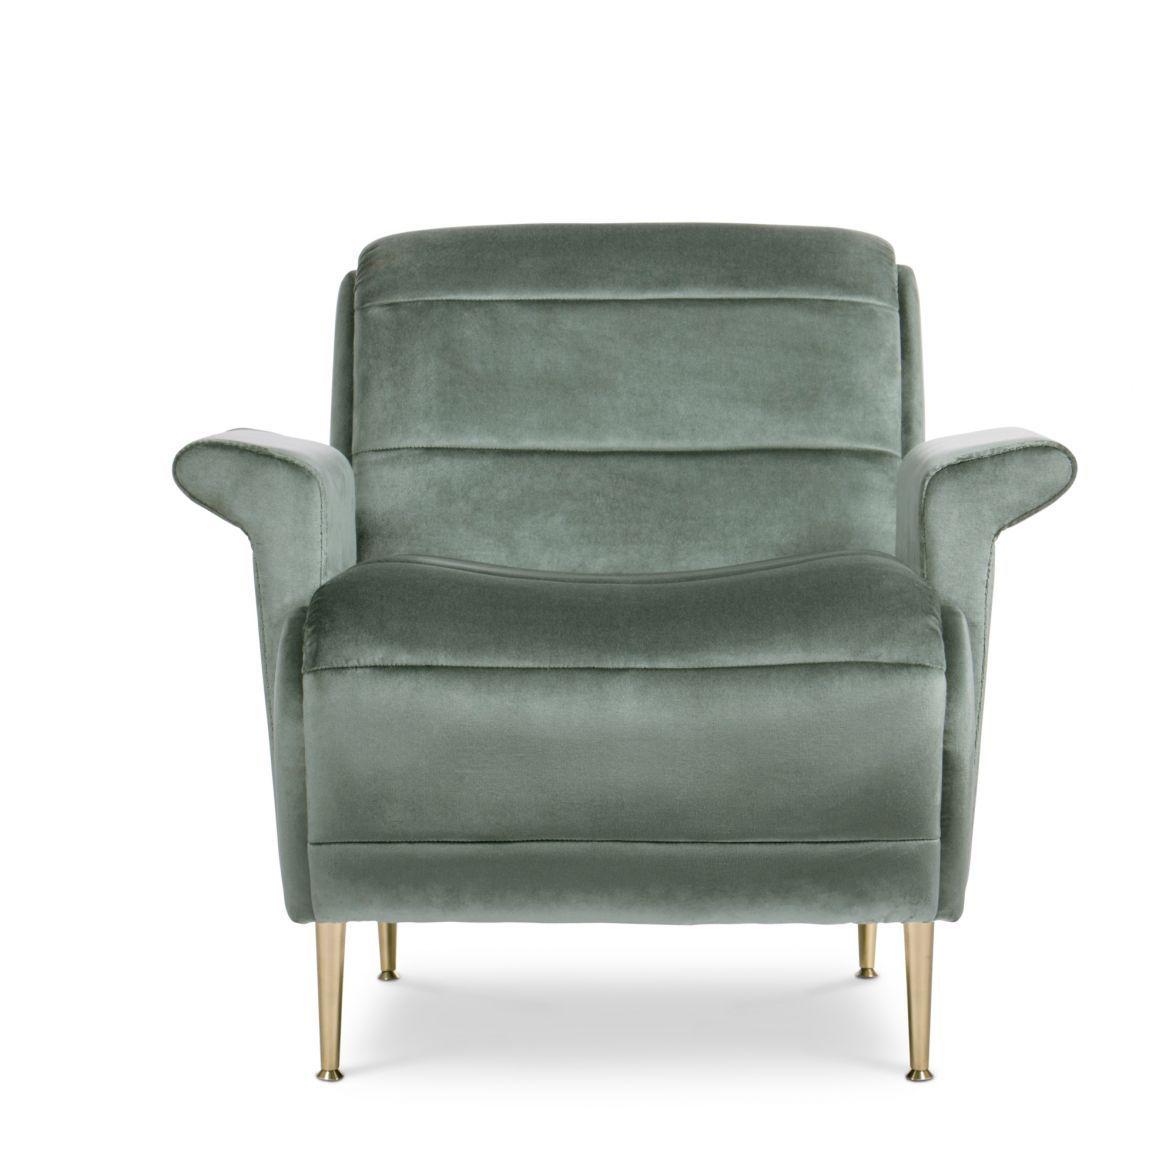 Bardot armchair фото цена